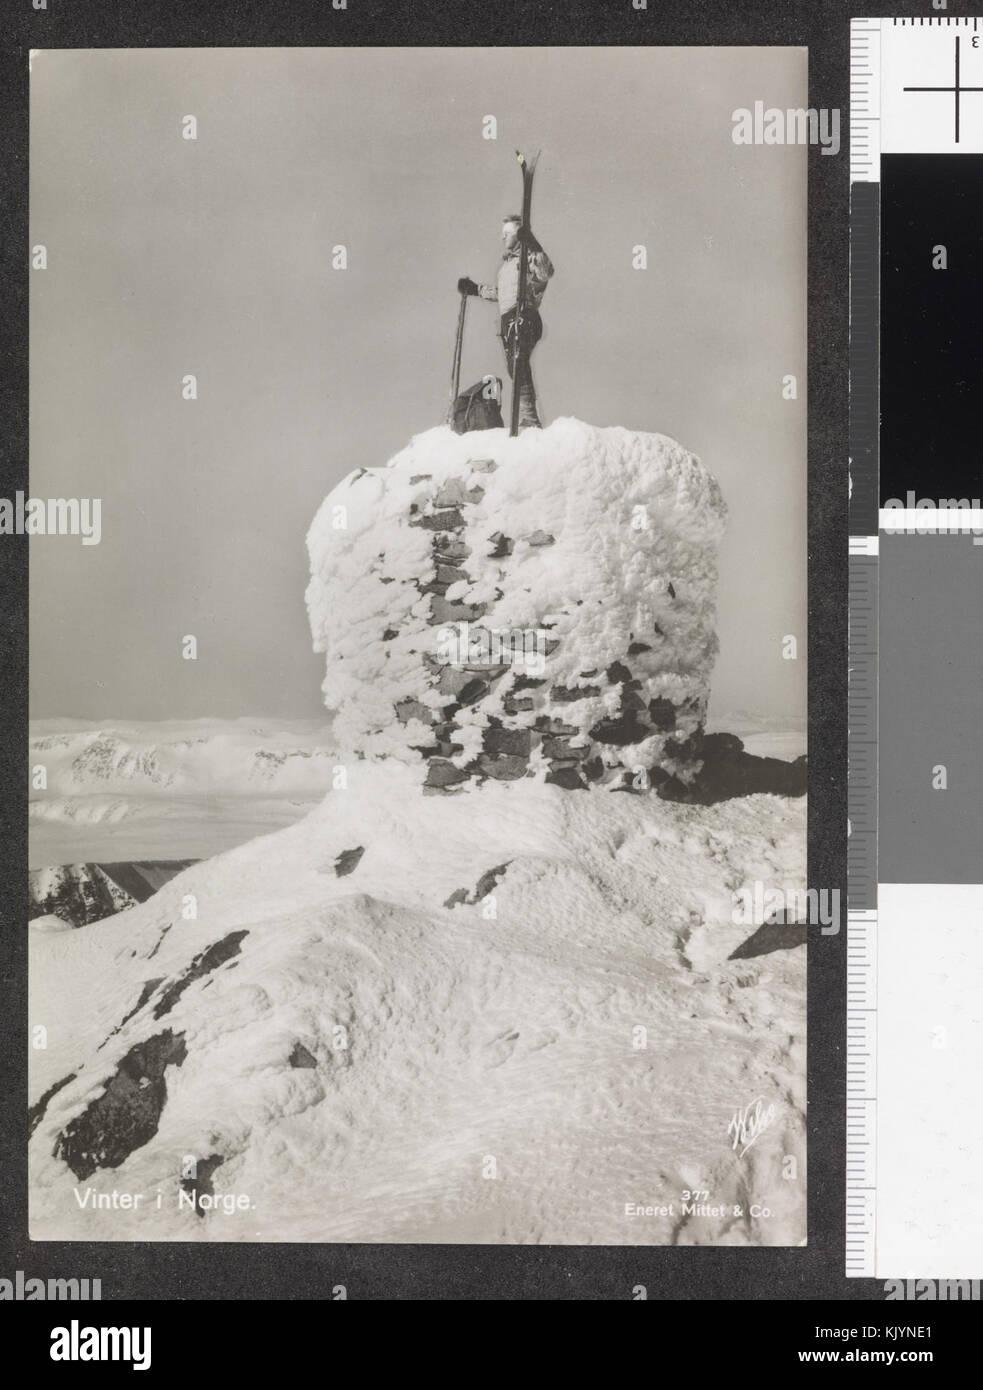 377. Vinter i Norge   no nb digifoto 20150116 00193 blds 07167 - Stock Image